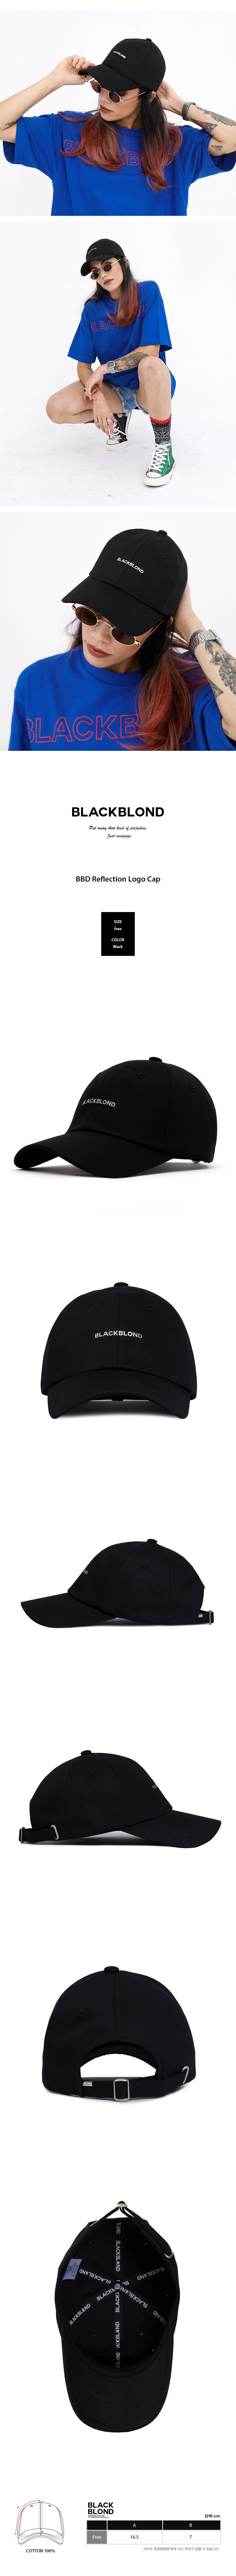 BBD-Reflection-Logo-Cap-%28Black%29.jpg